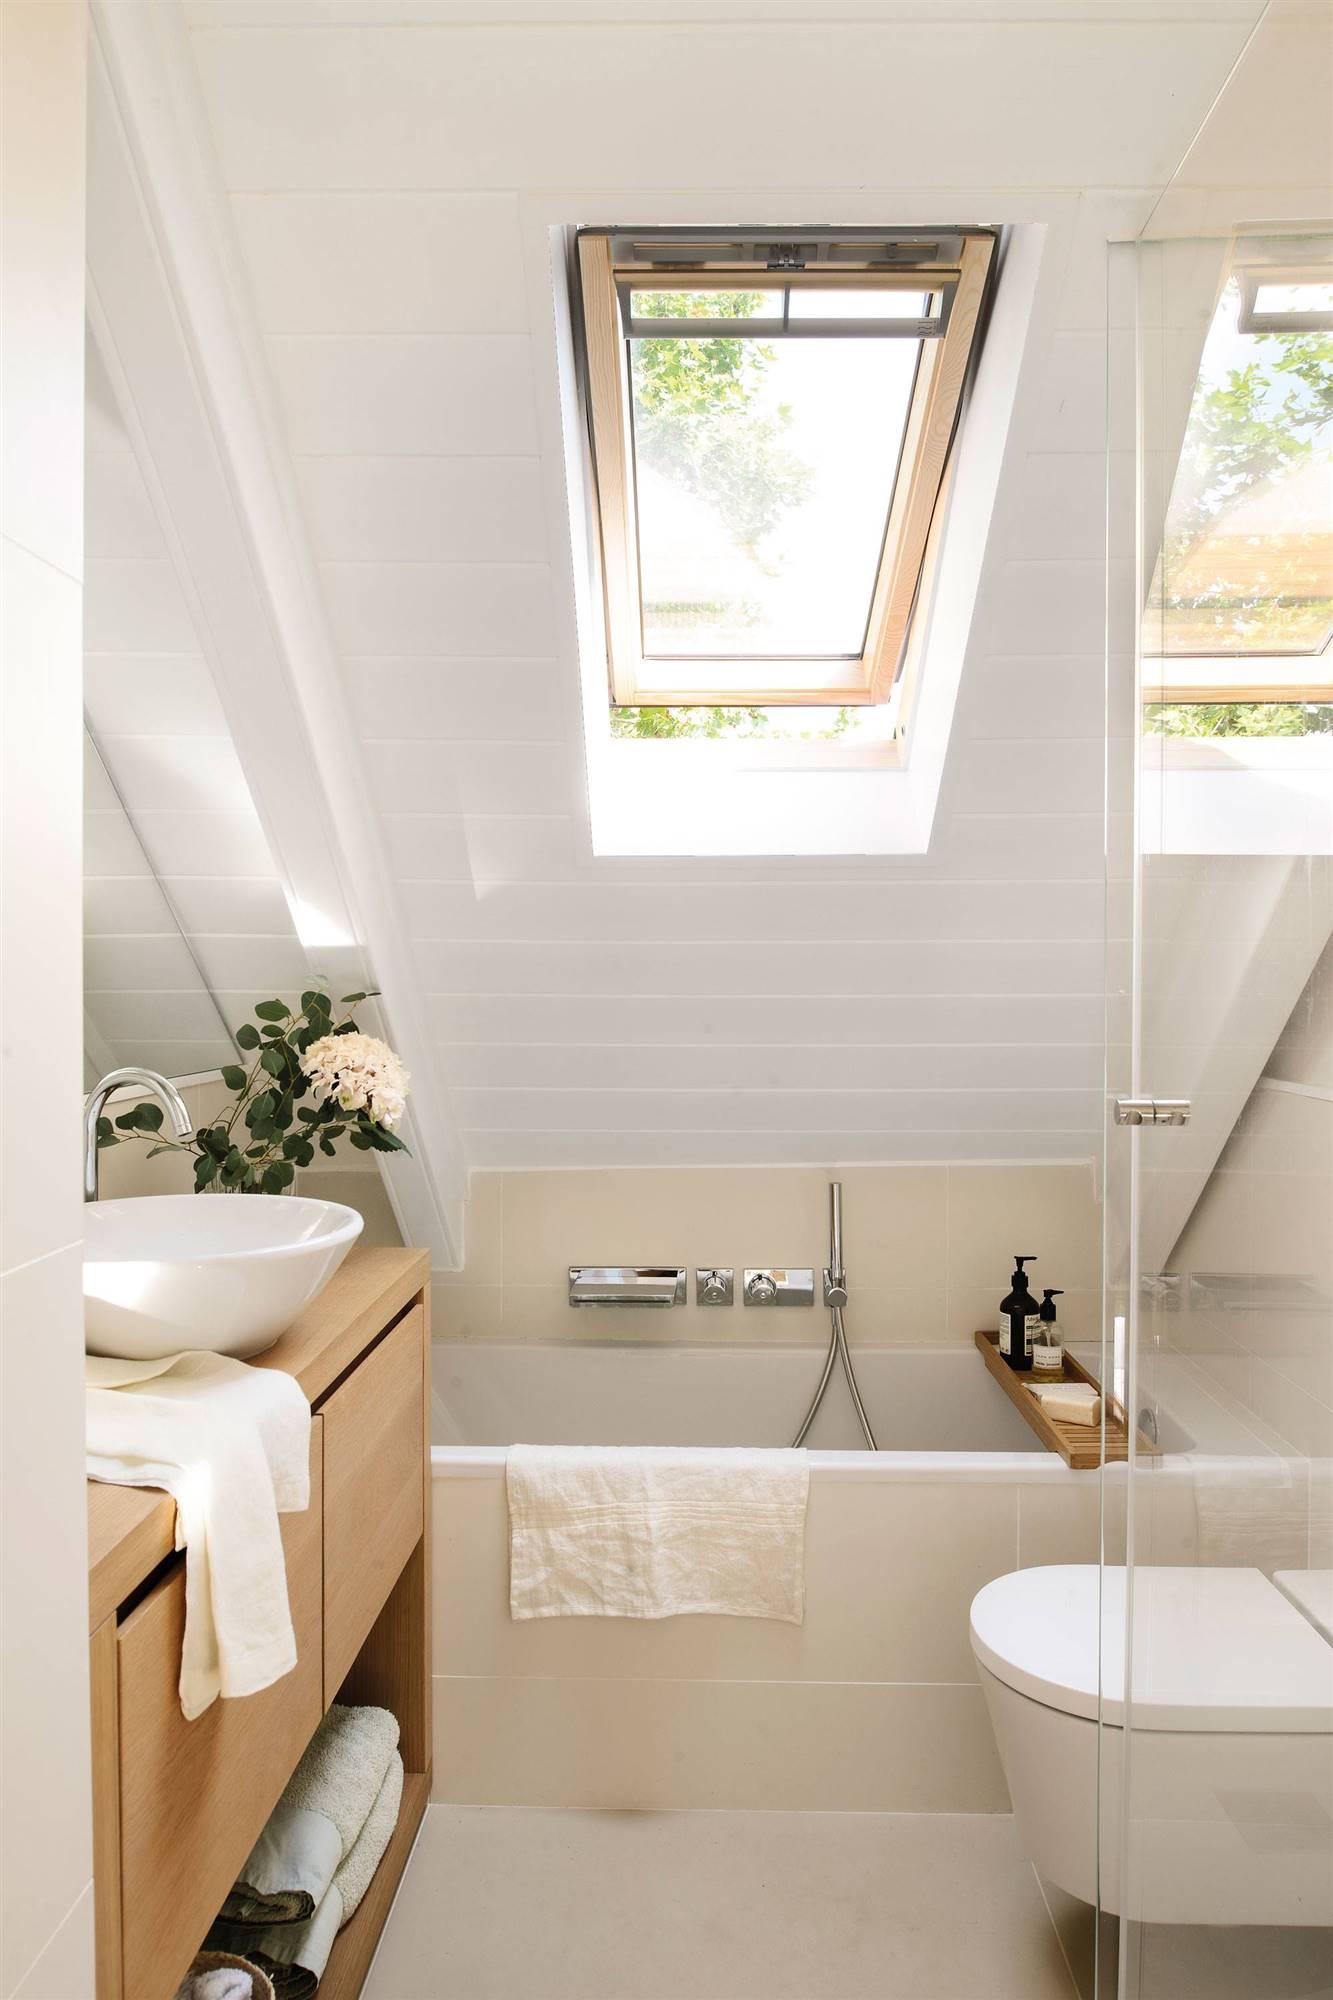 Attic bathroom of less than 6 m2 00464945. 5. A bathroom in a 4 m2 attic